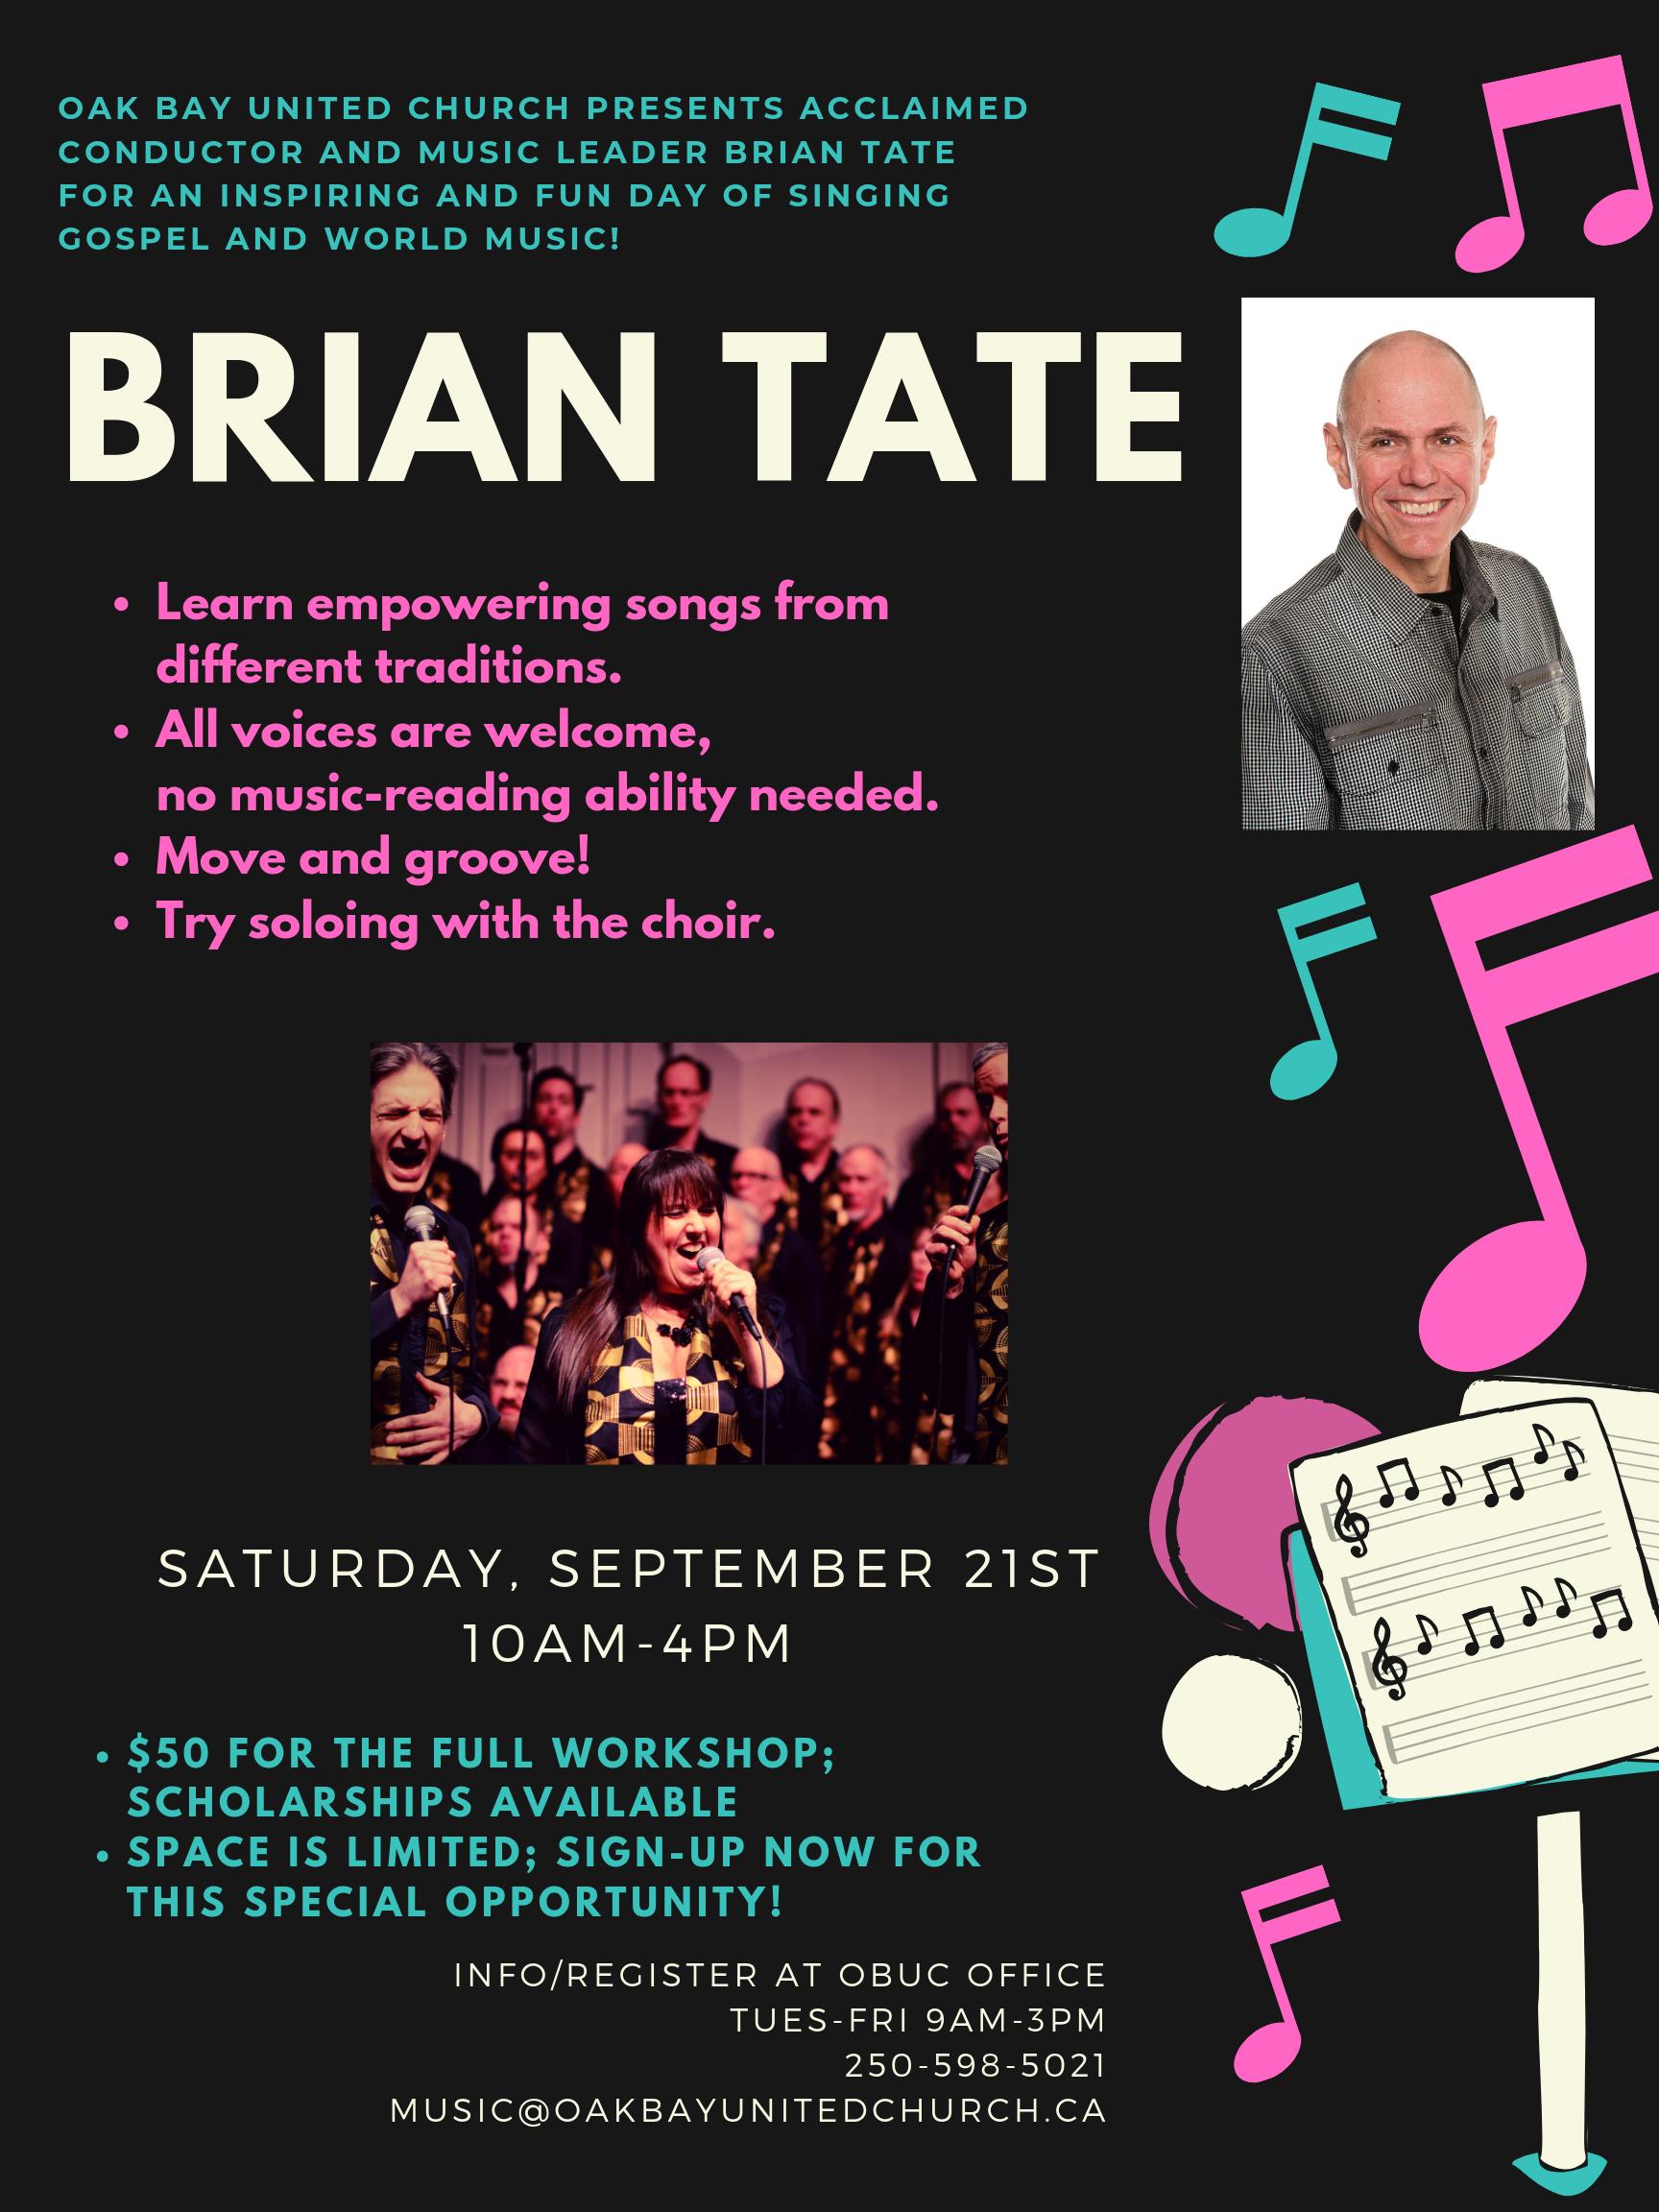 BrianTate Workshop.png